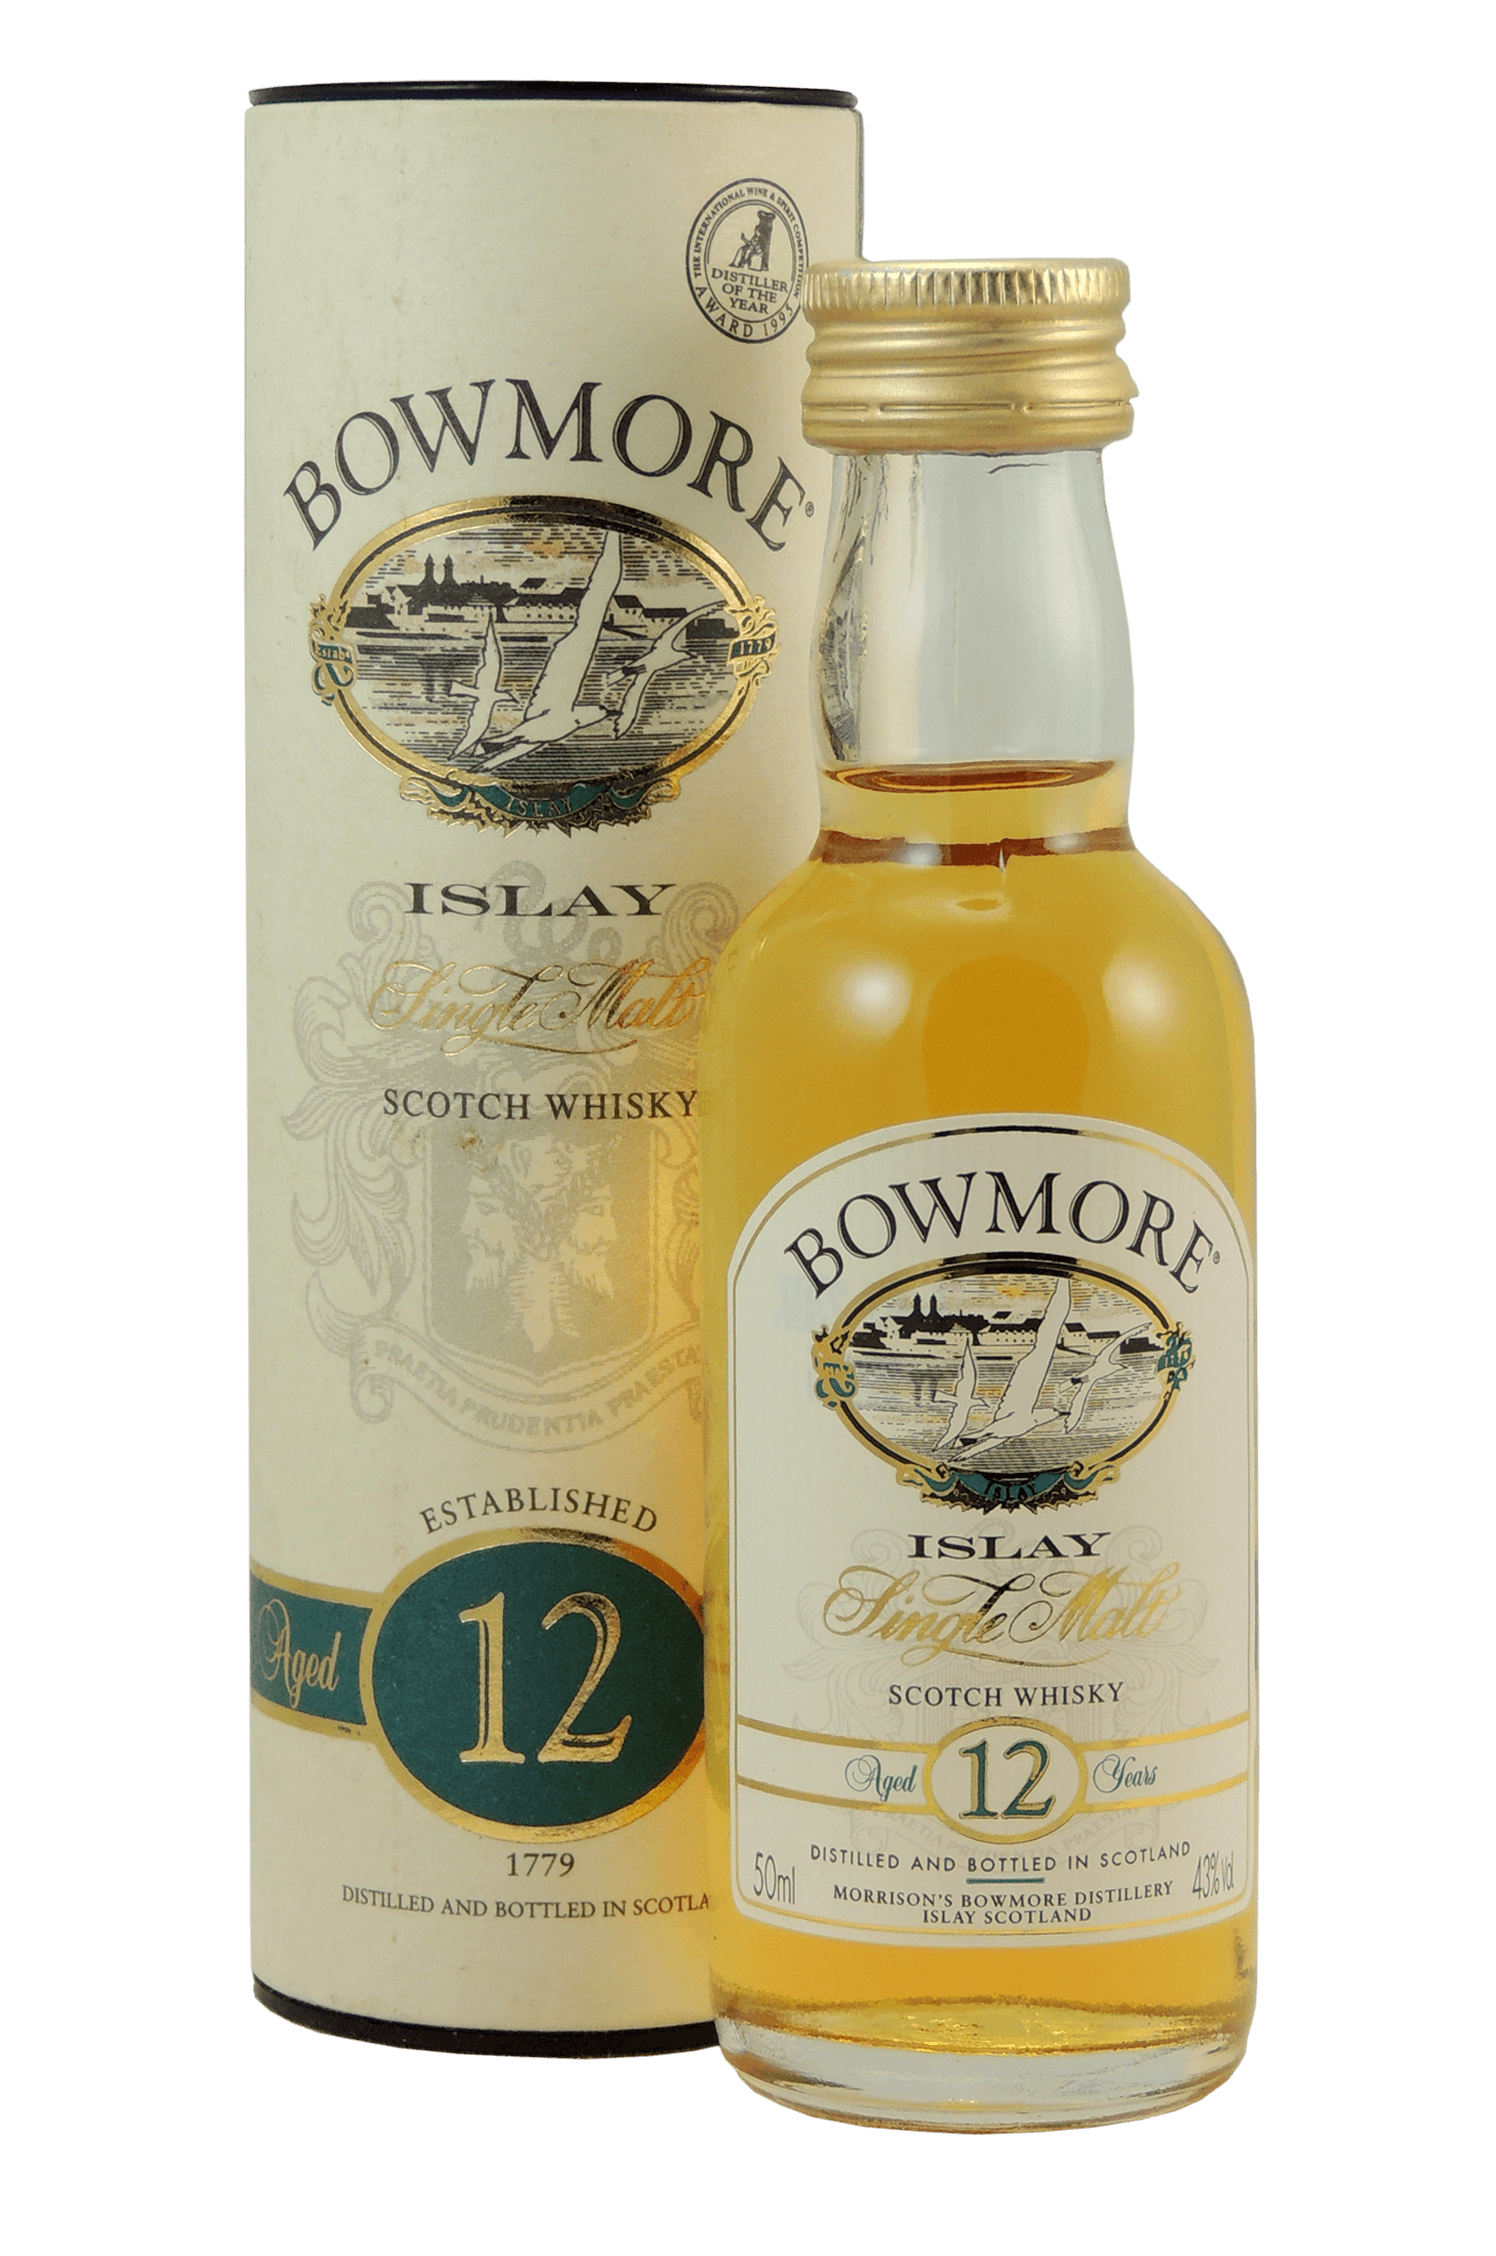 Bowmore Islay 12 Scotch Whisky